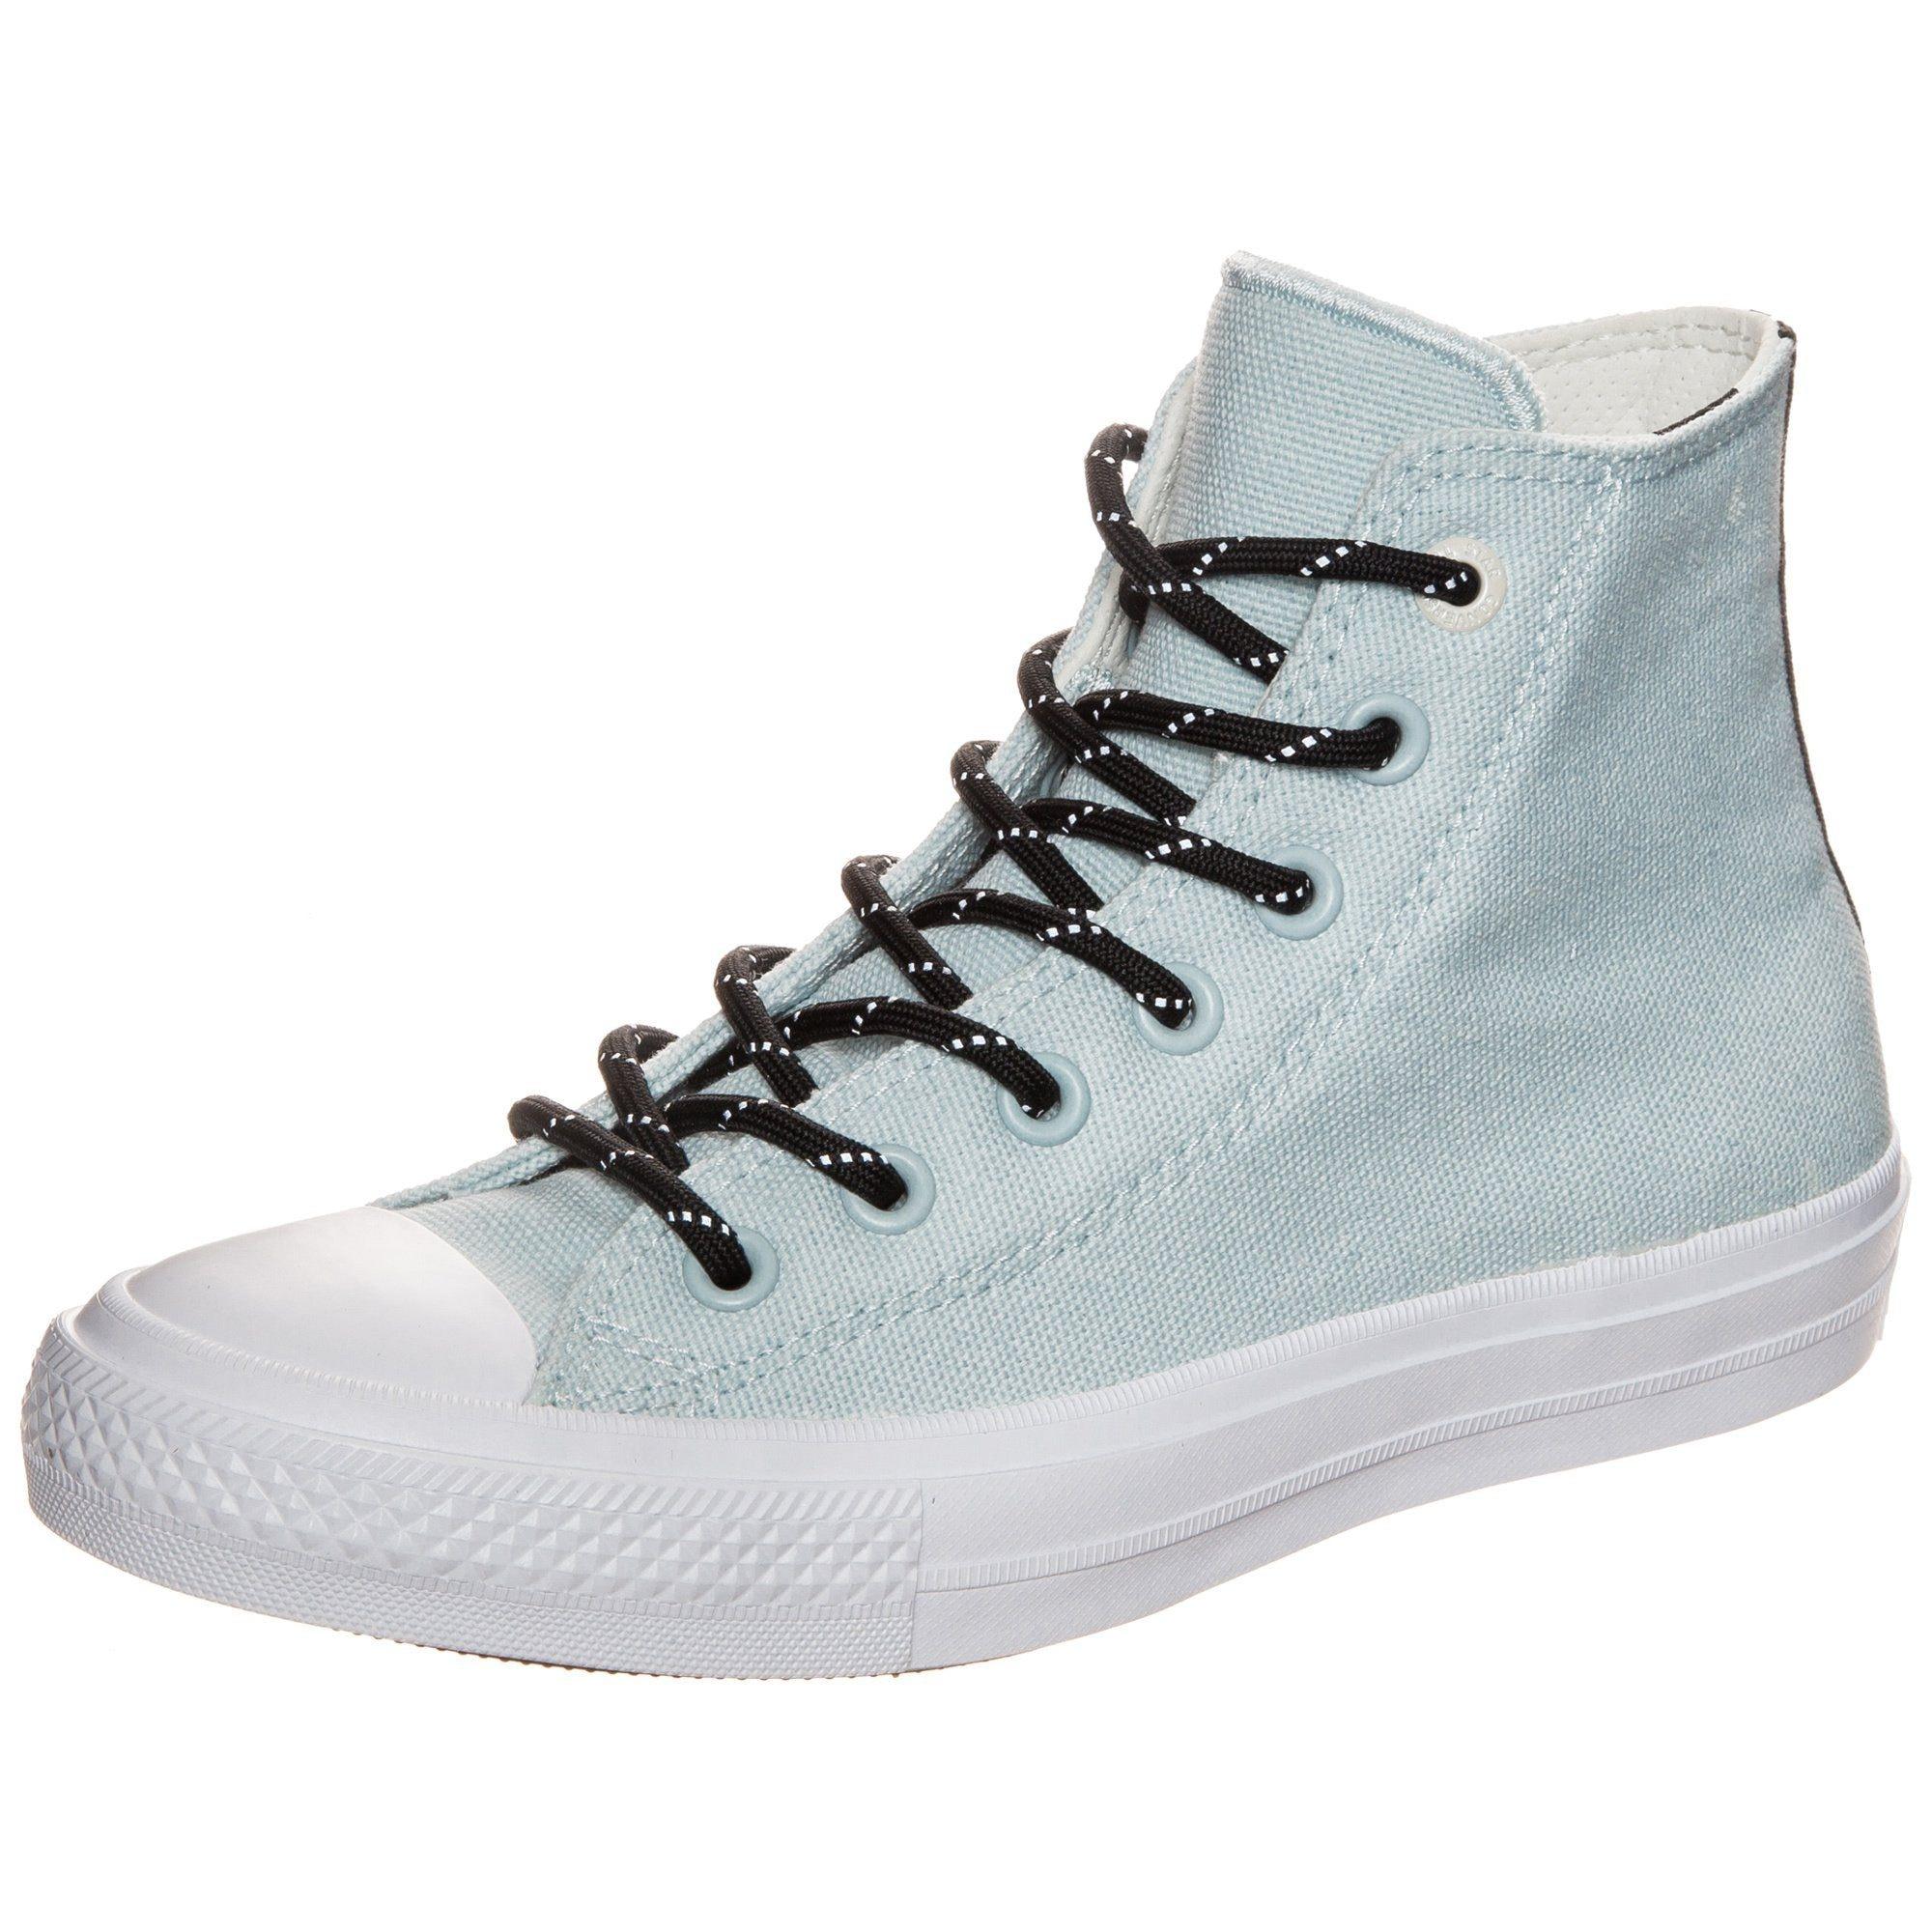 Converse Sneaker Chuck Taylor All Star Ii Shield Canvas per Rechnung | Gutes Preis-Leistungs-Verhältnis, es lohnt sich